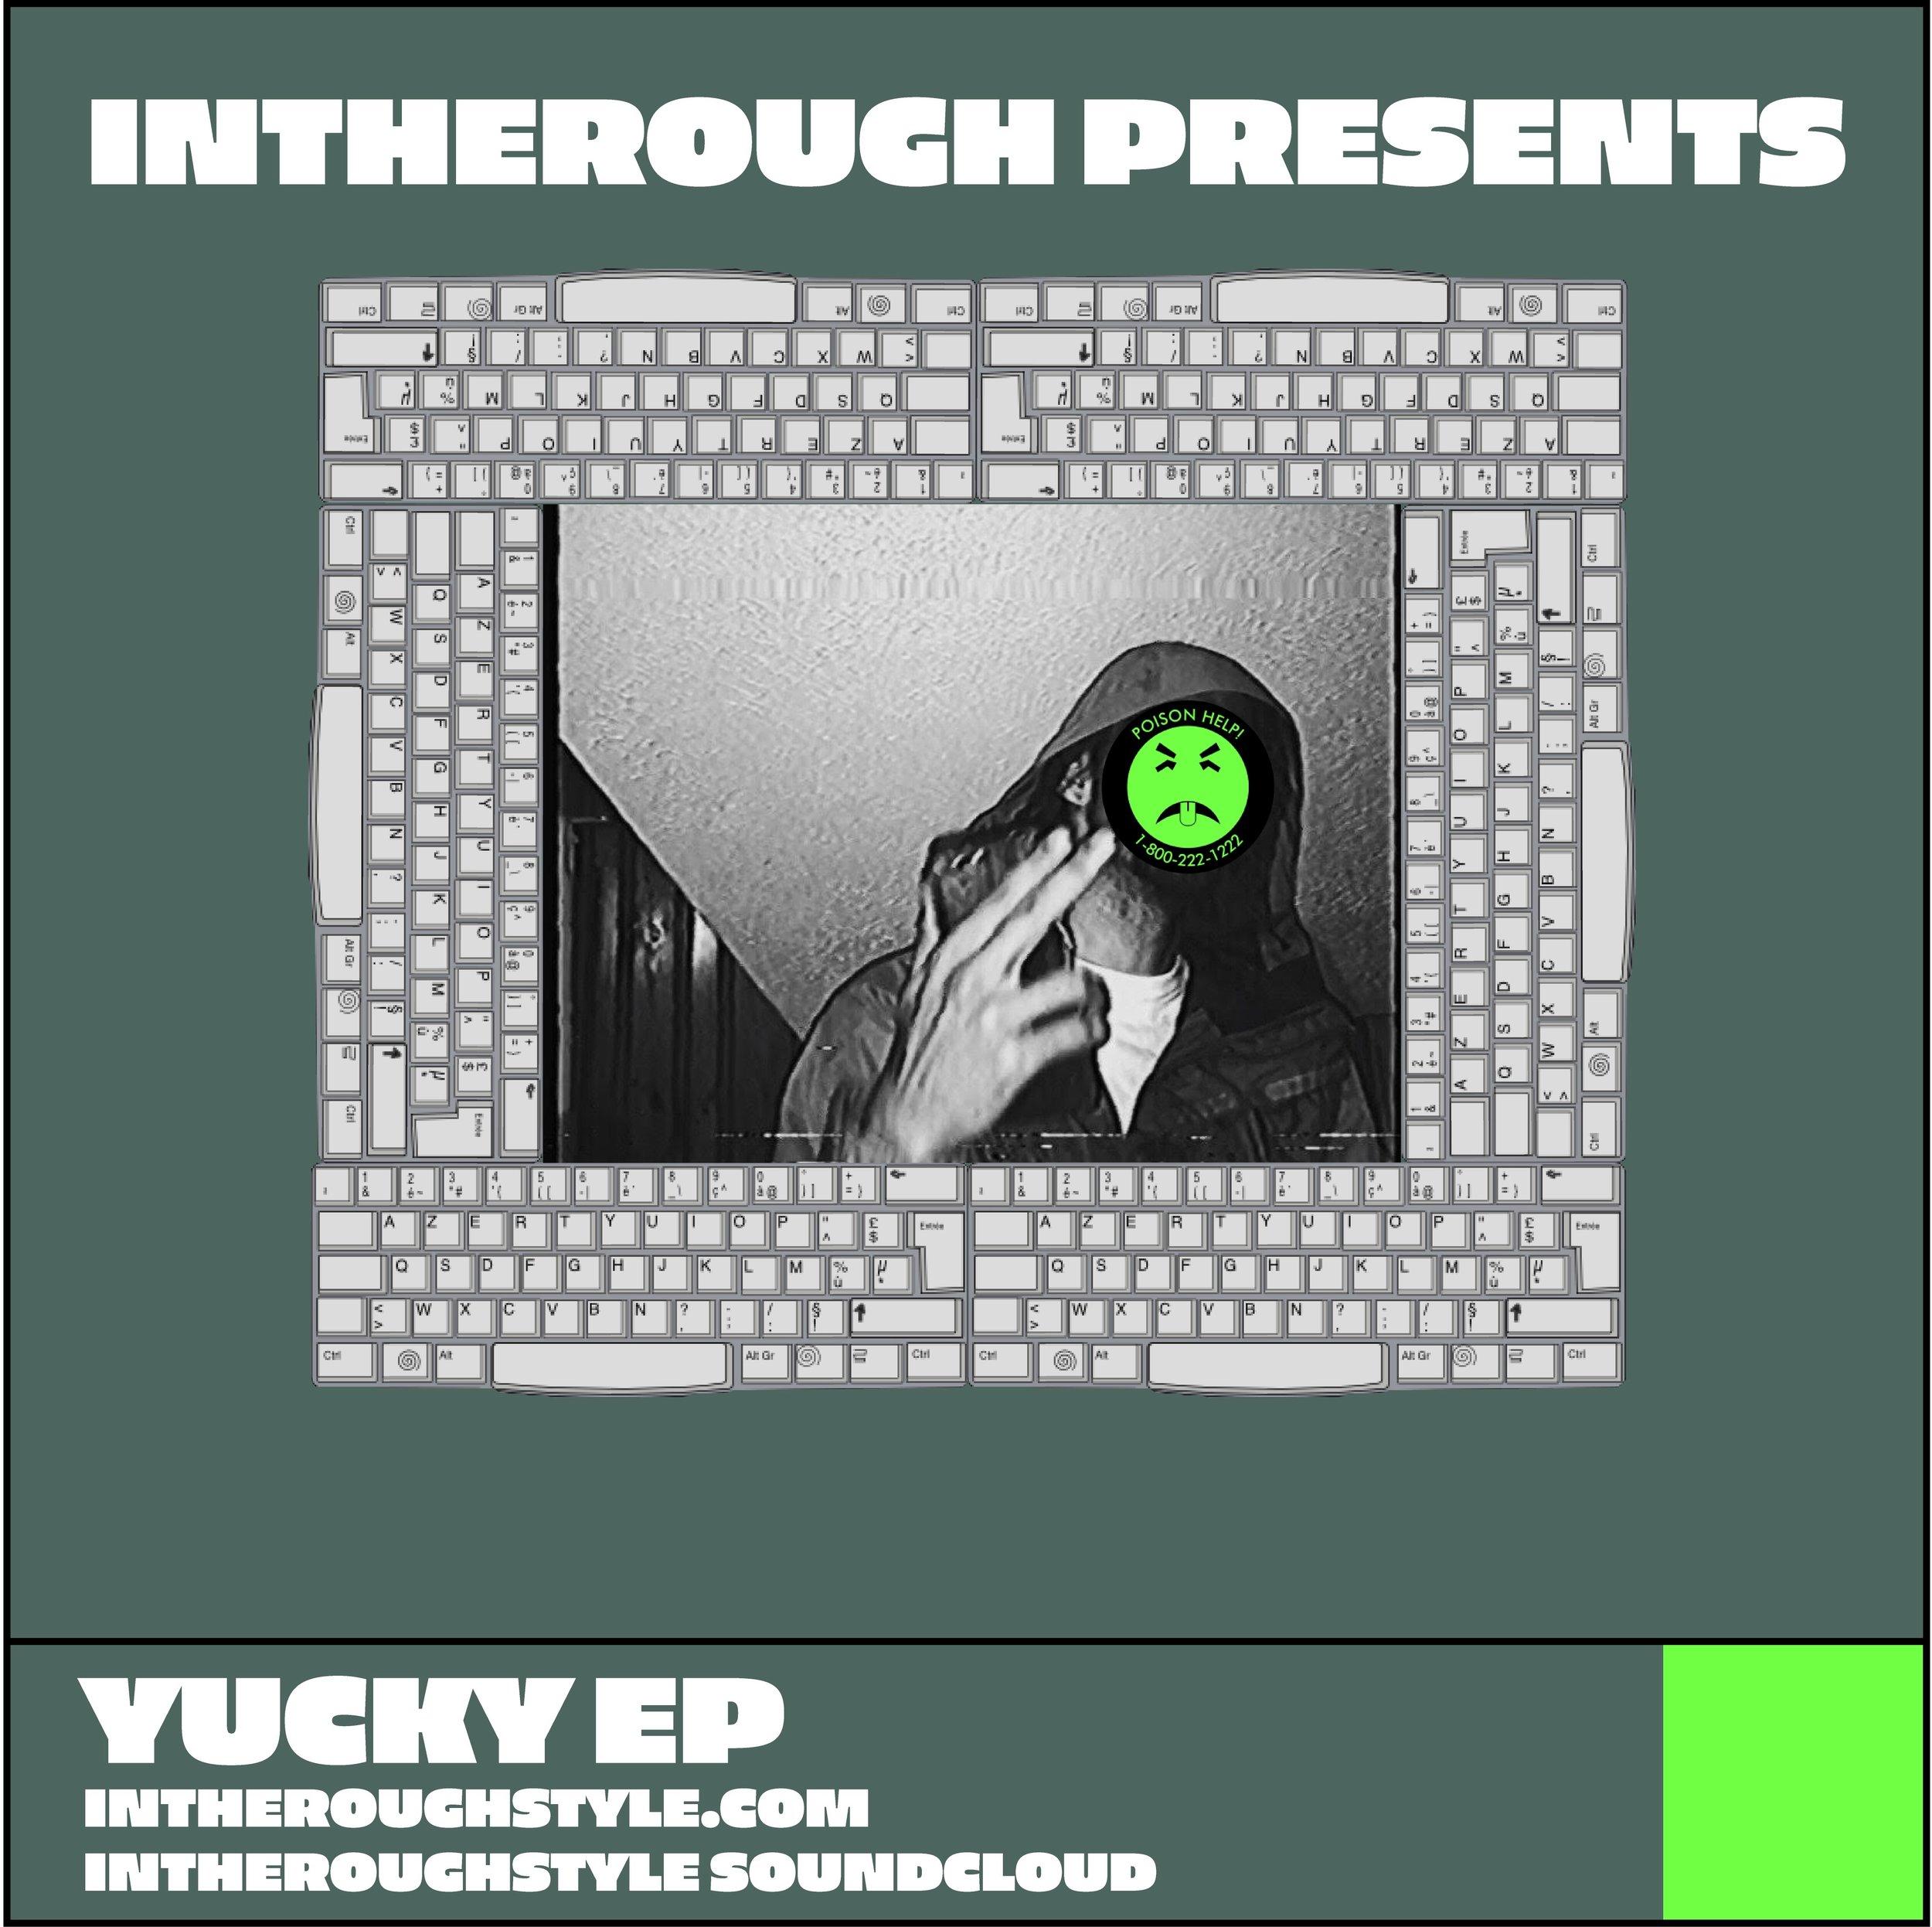 Yucky exclusive music2.jpg